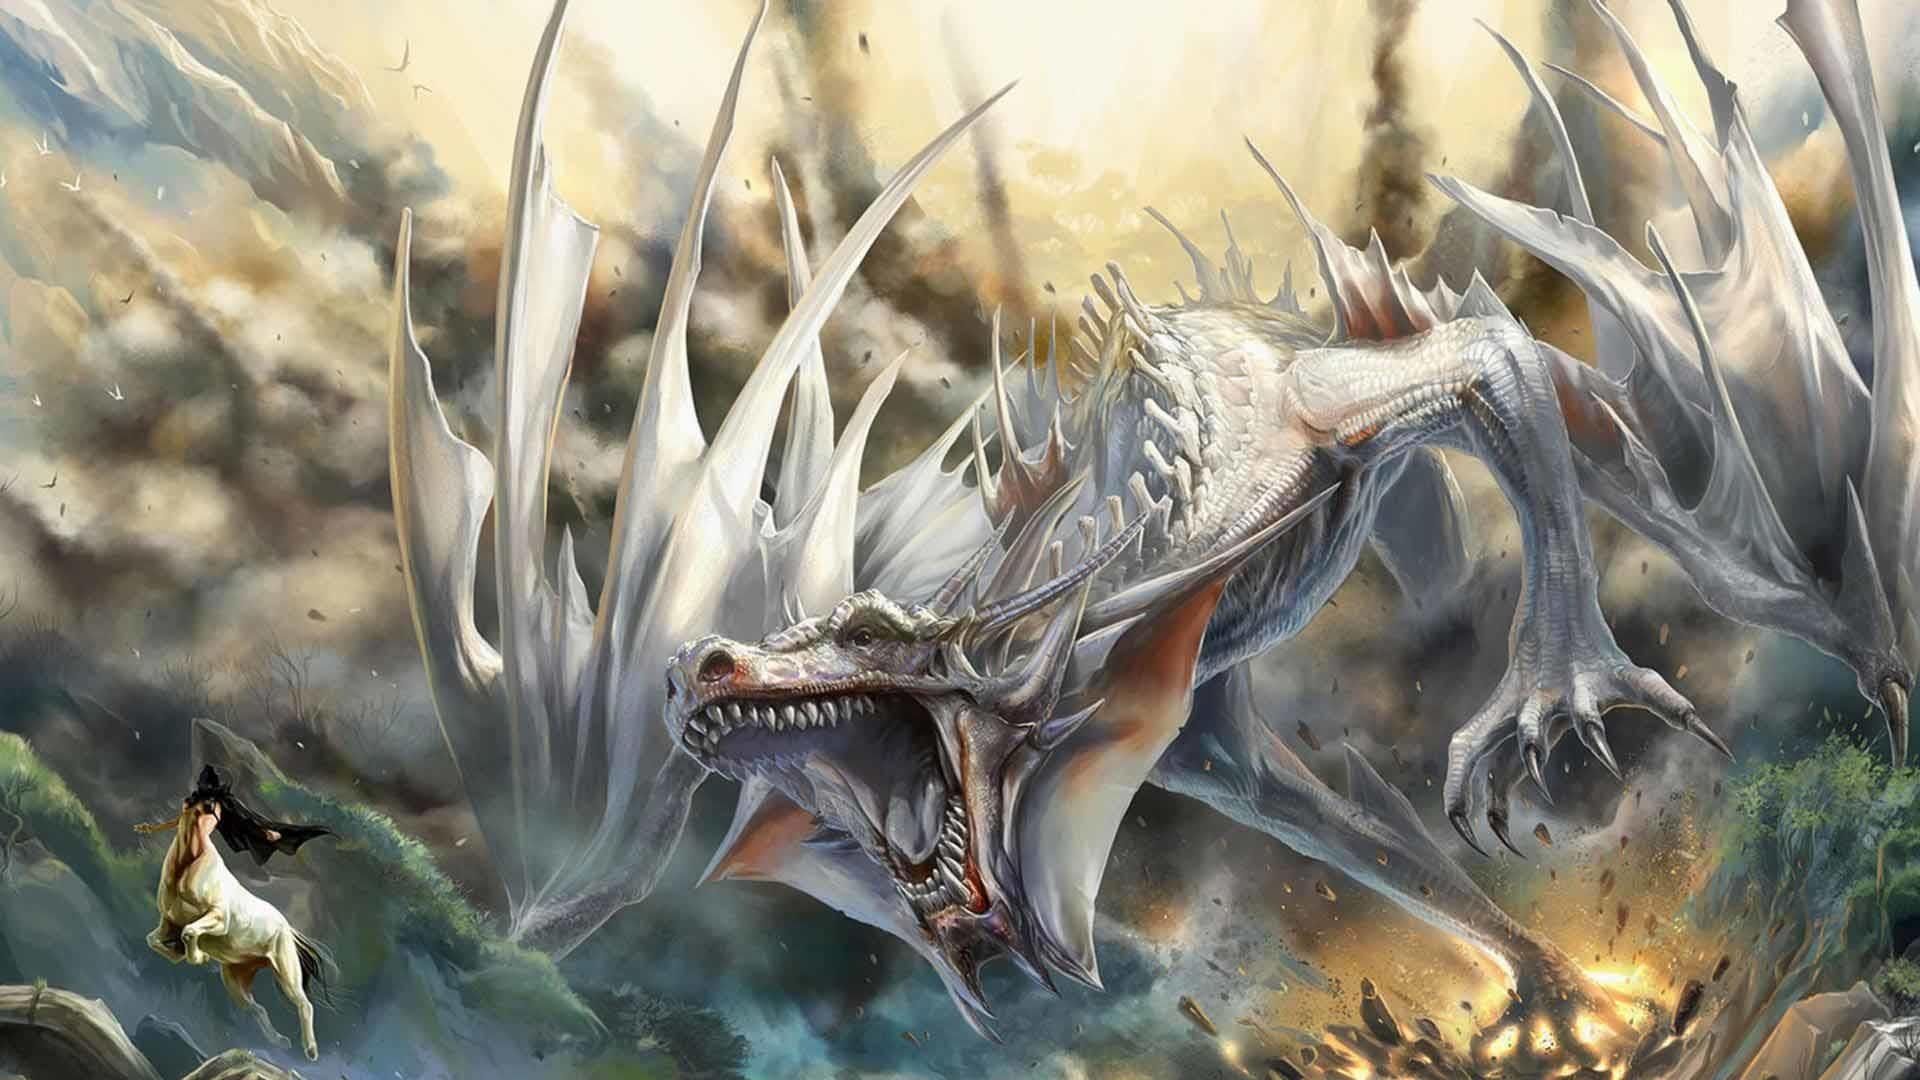 anime dragon wallpaper (67+ images)